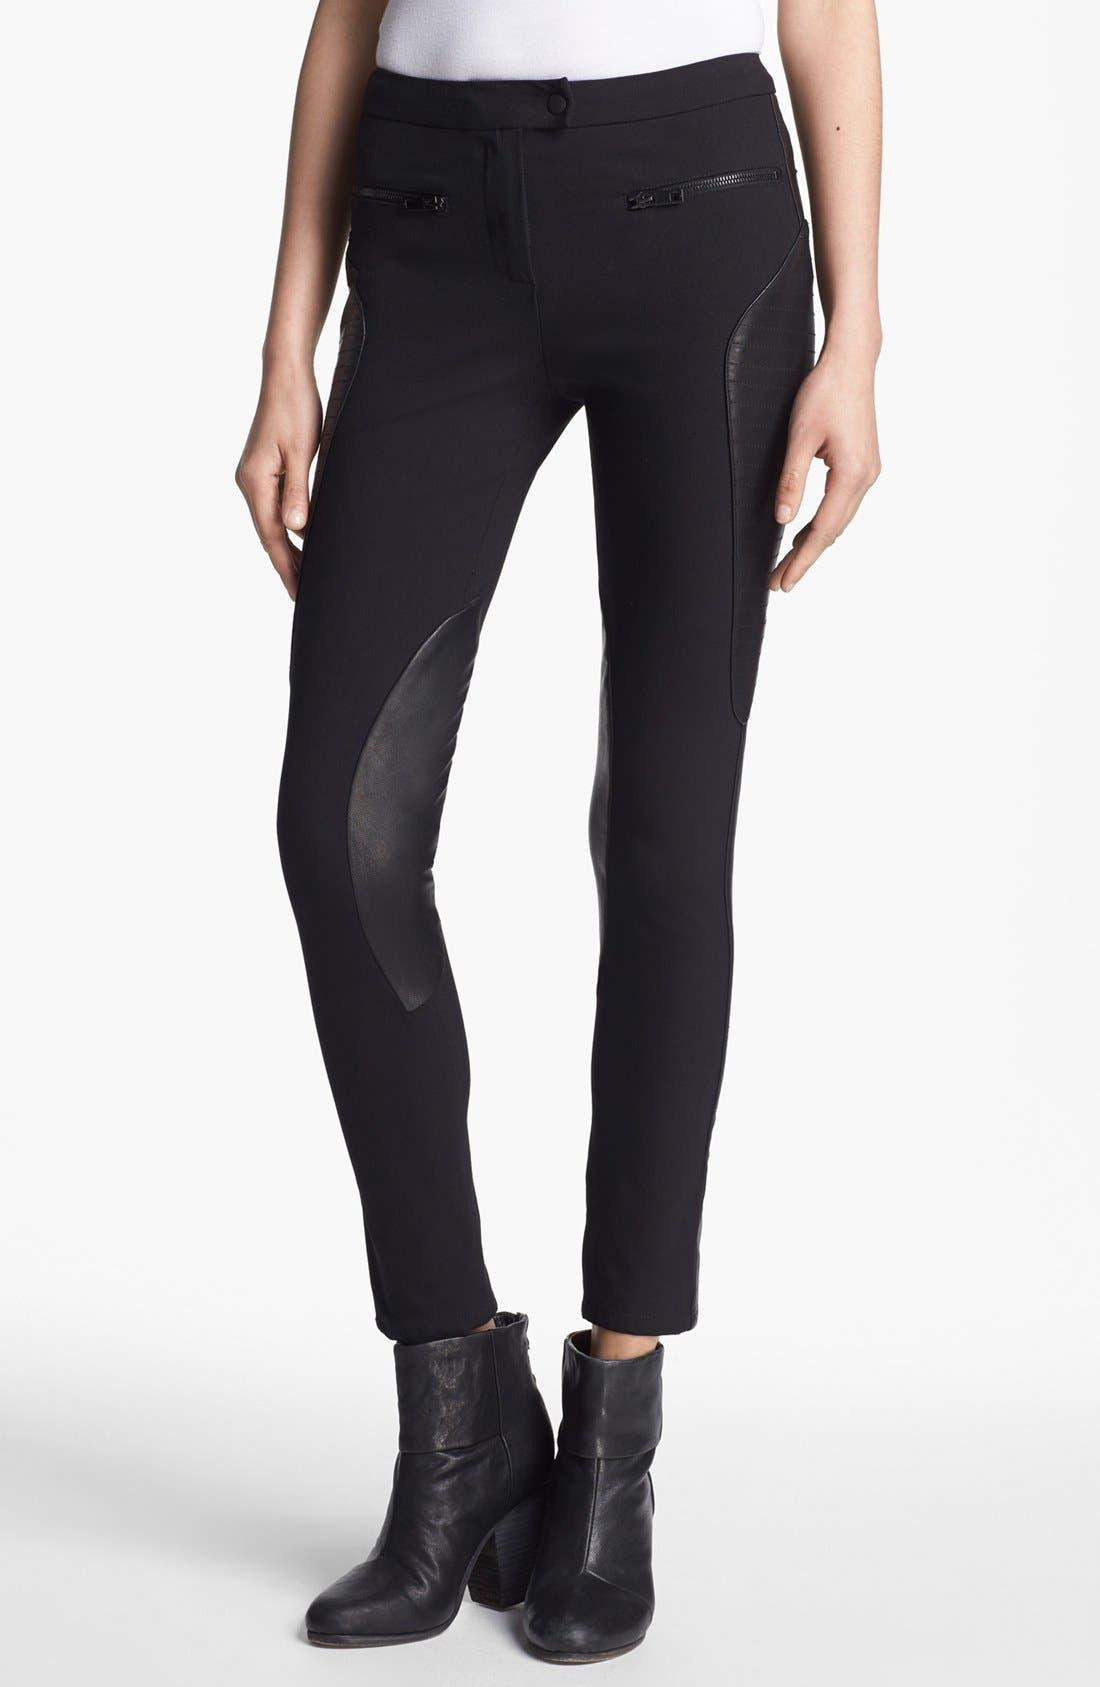 Main Image - rag & bone 'Ilford' Leather Panel Pants